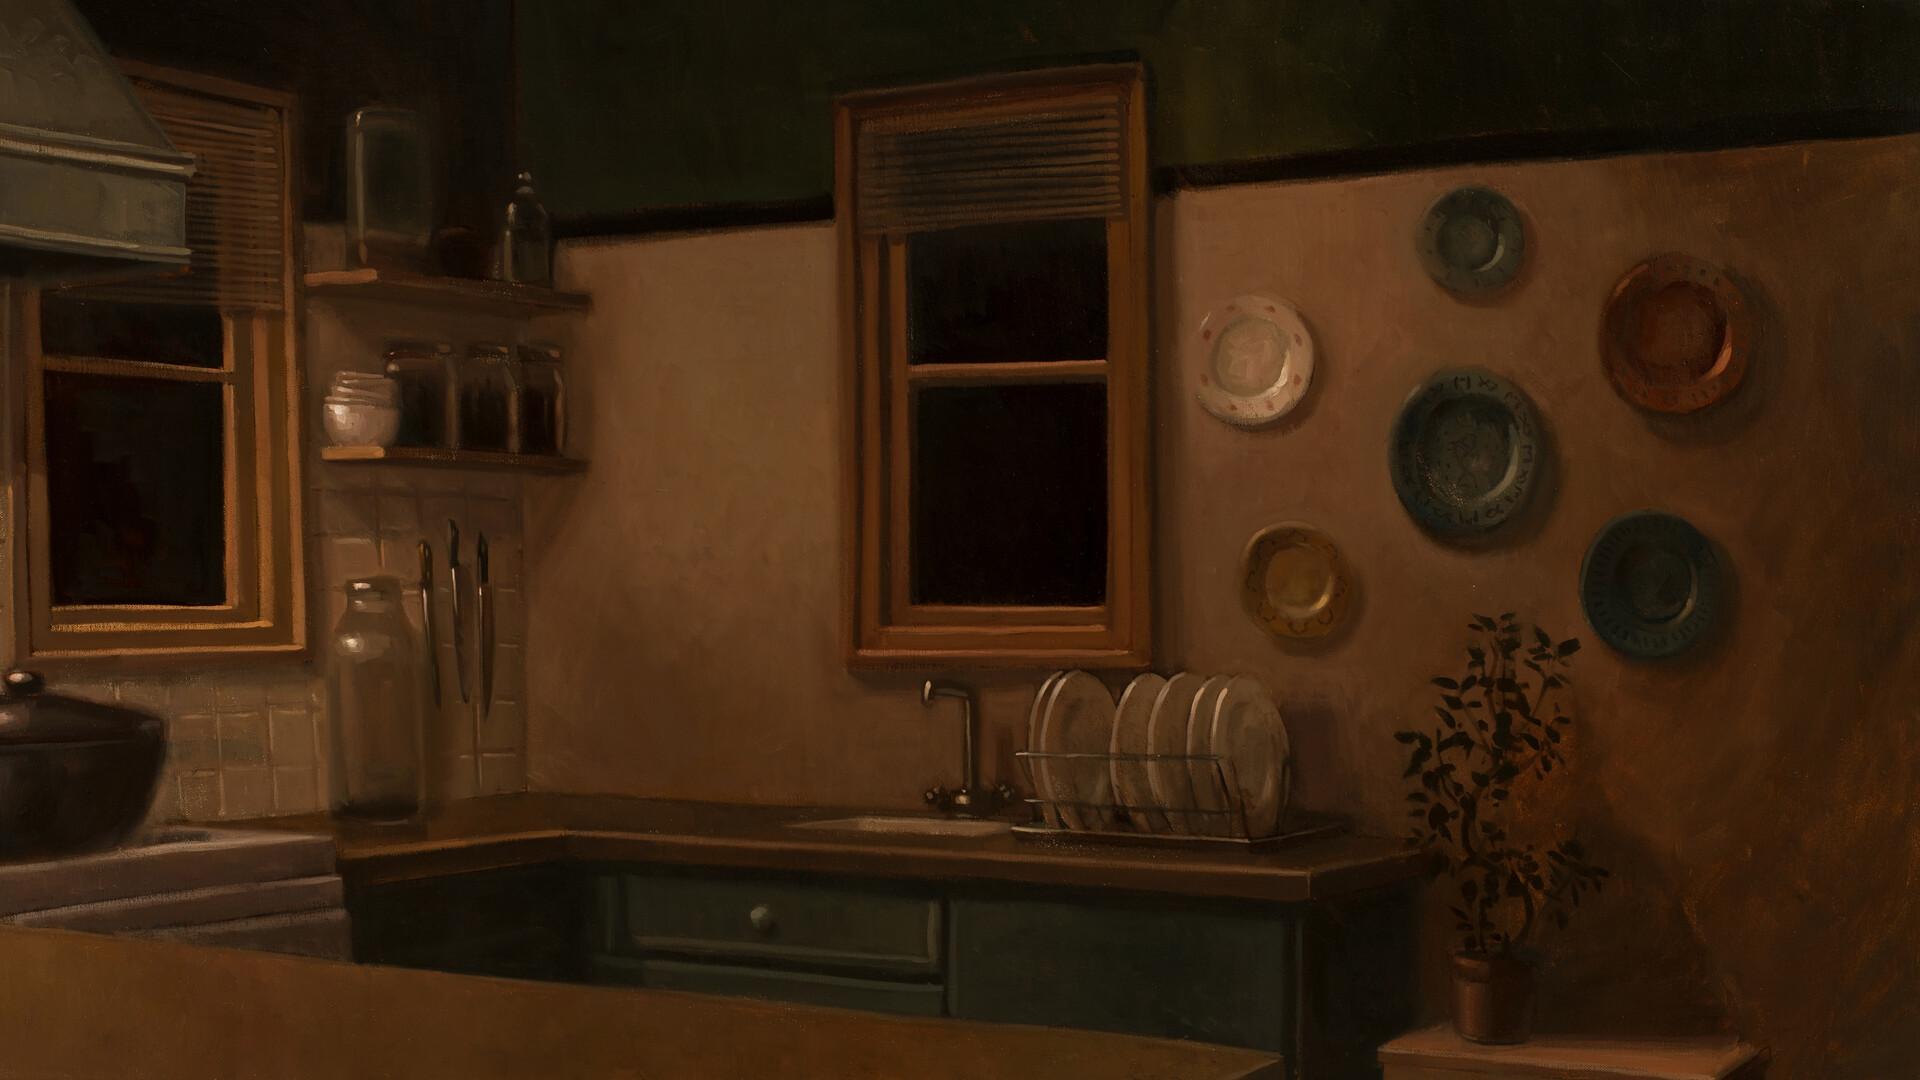 Milan Smidt Undone Alma S Kitchen Night